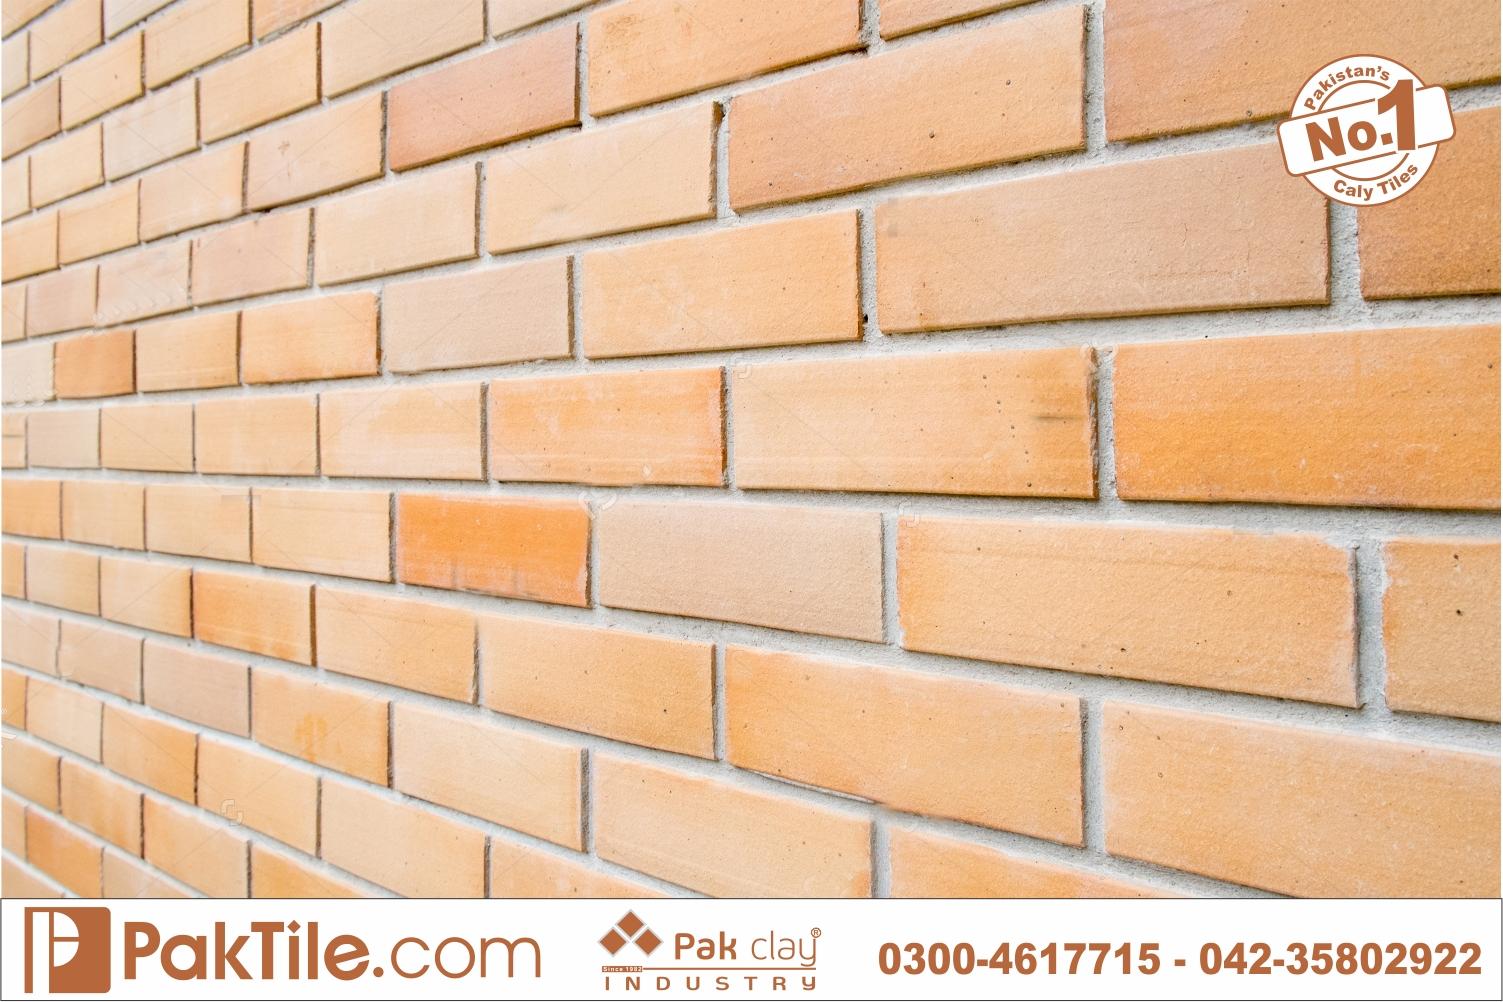 16 Terracotta brick tiles bricks wall tiles brick wall tiles brick tiles design images